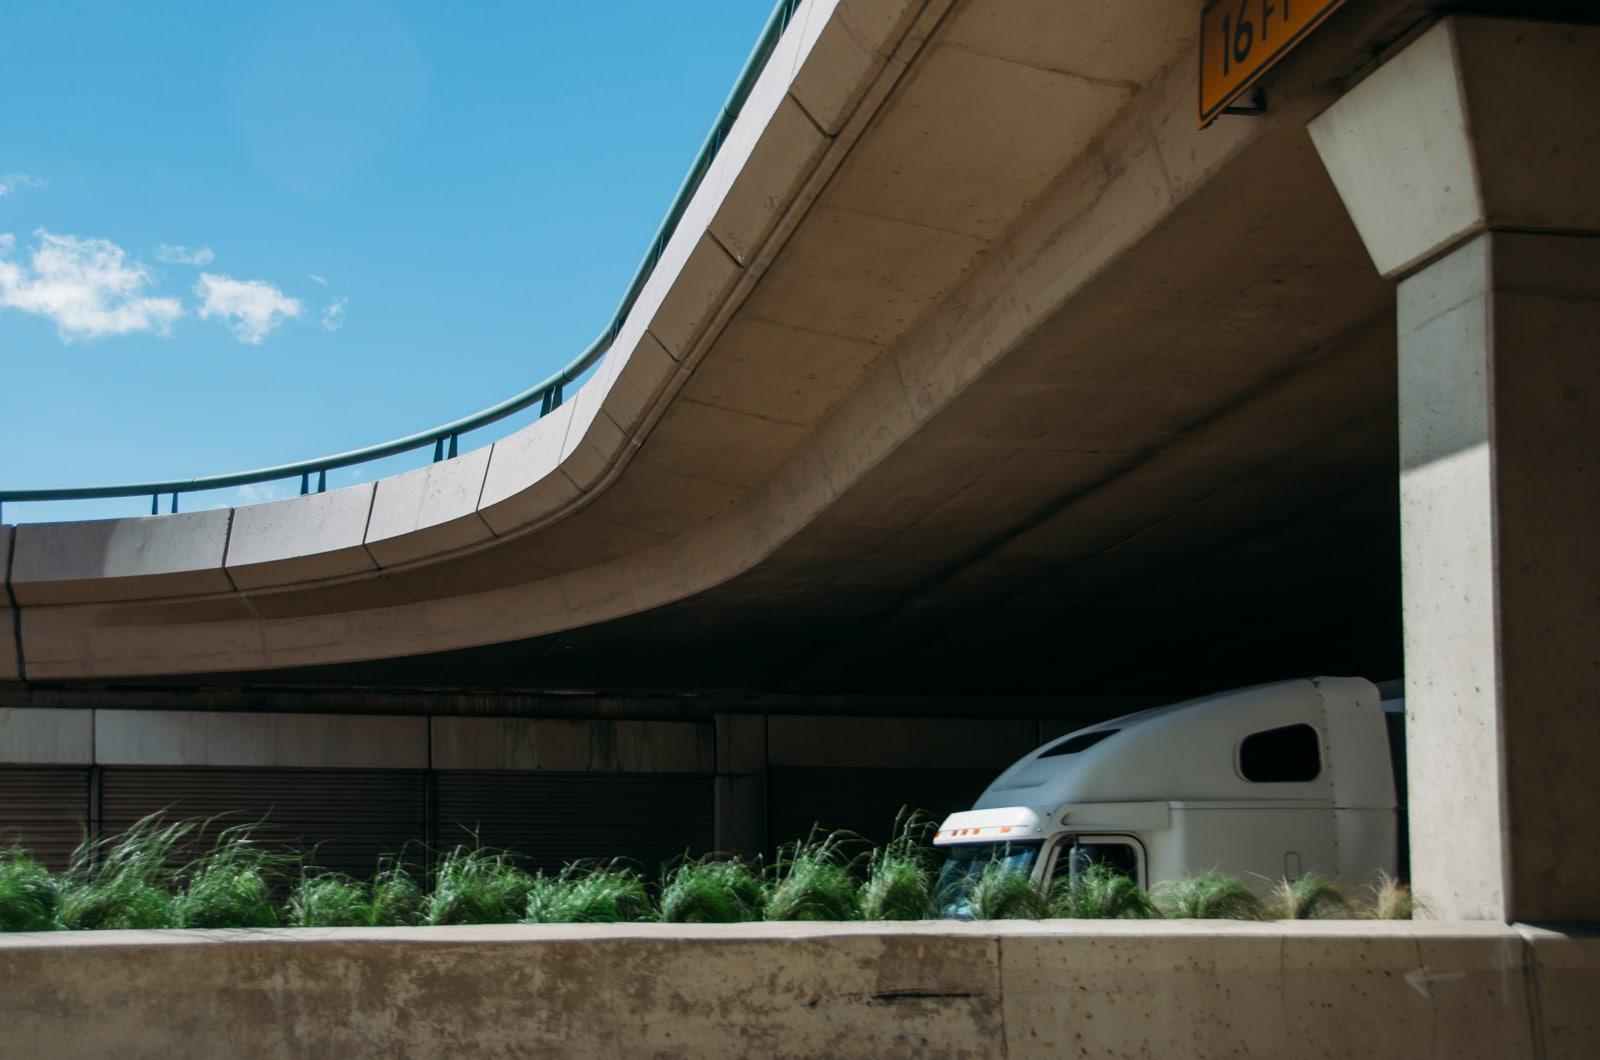 A semi going under a bridge on highway 75